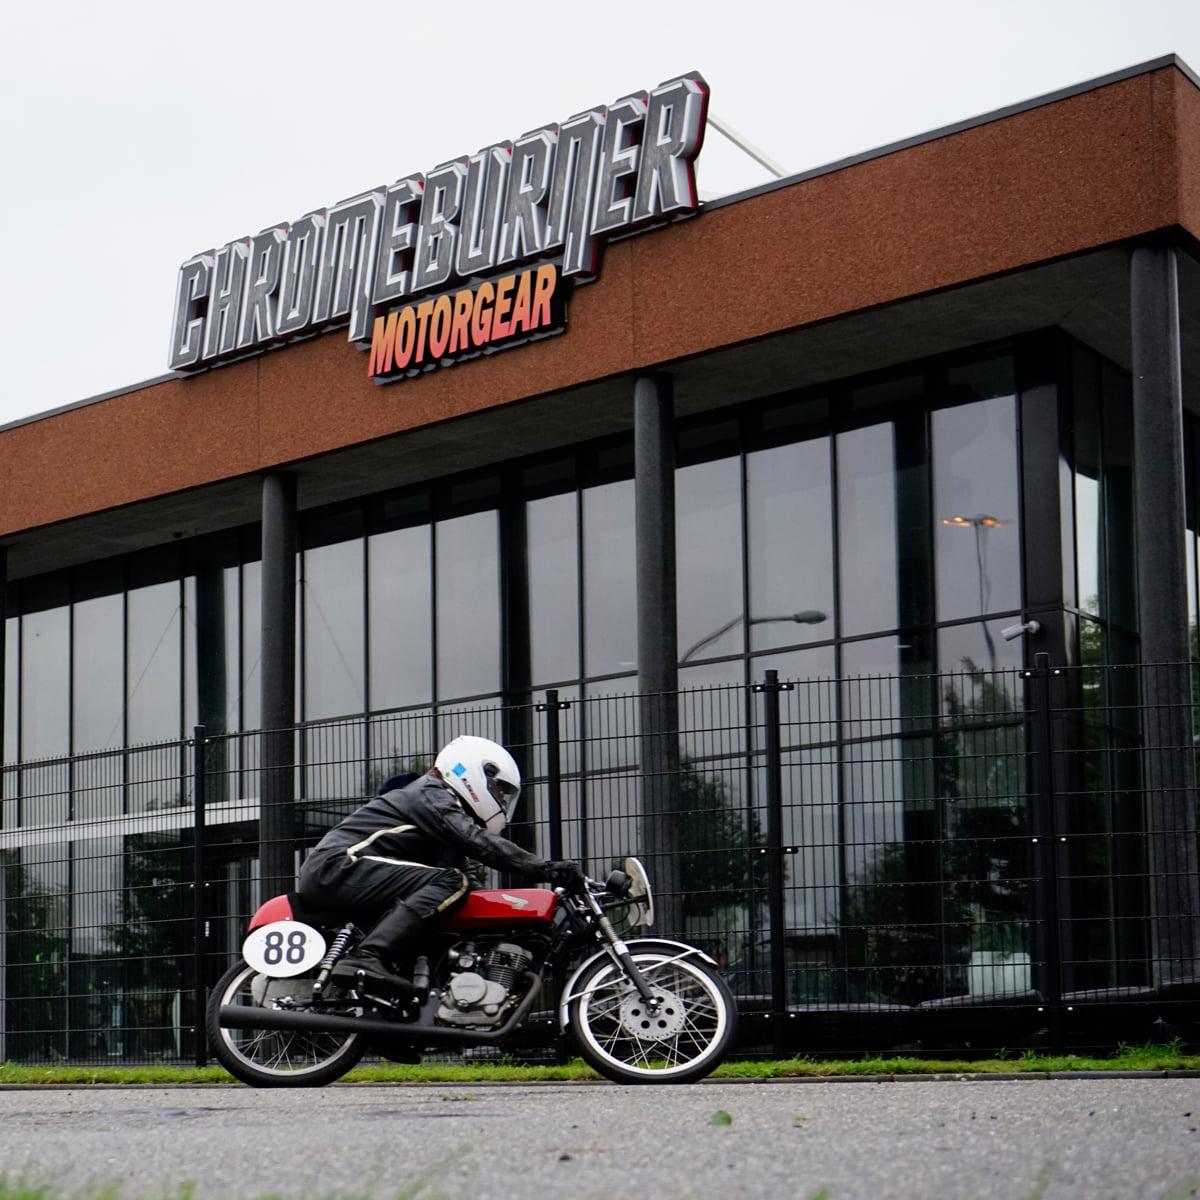 ChromeBurner Motorgear Nieuwkuijk